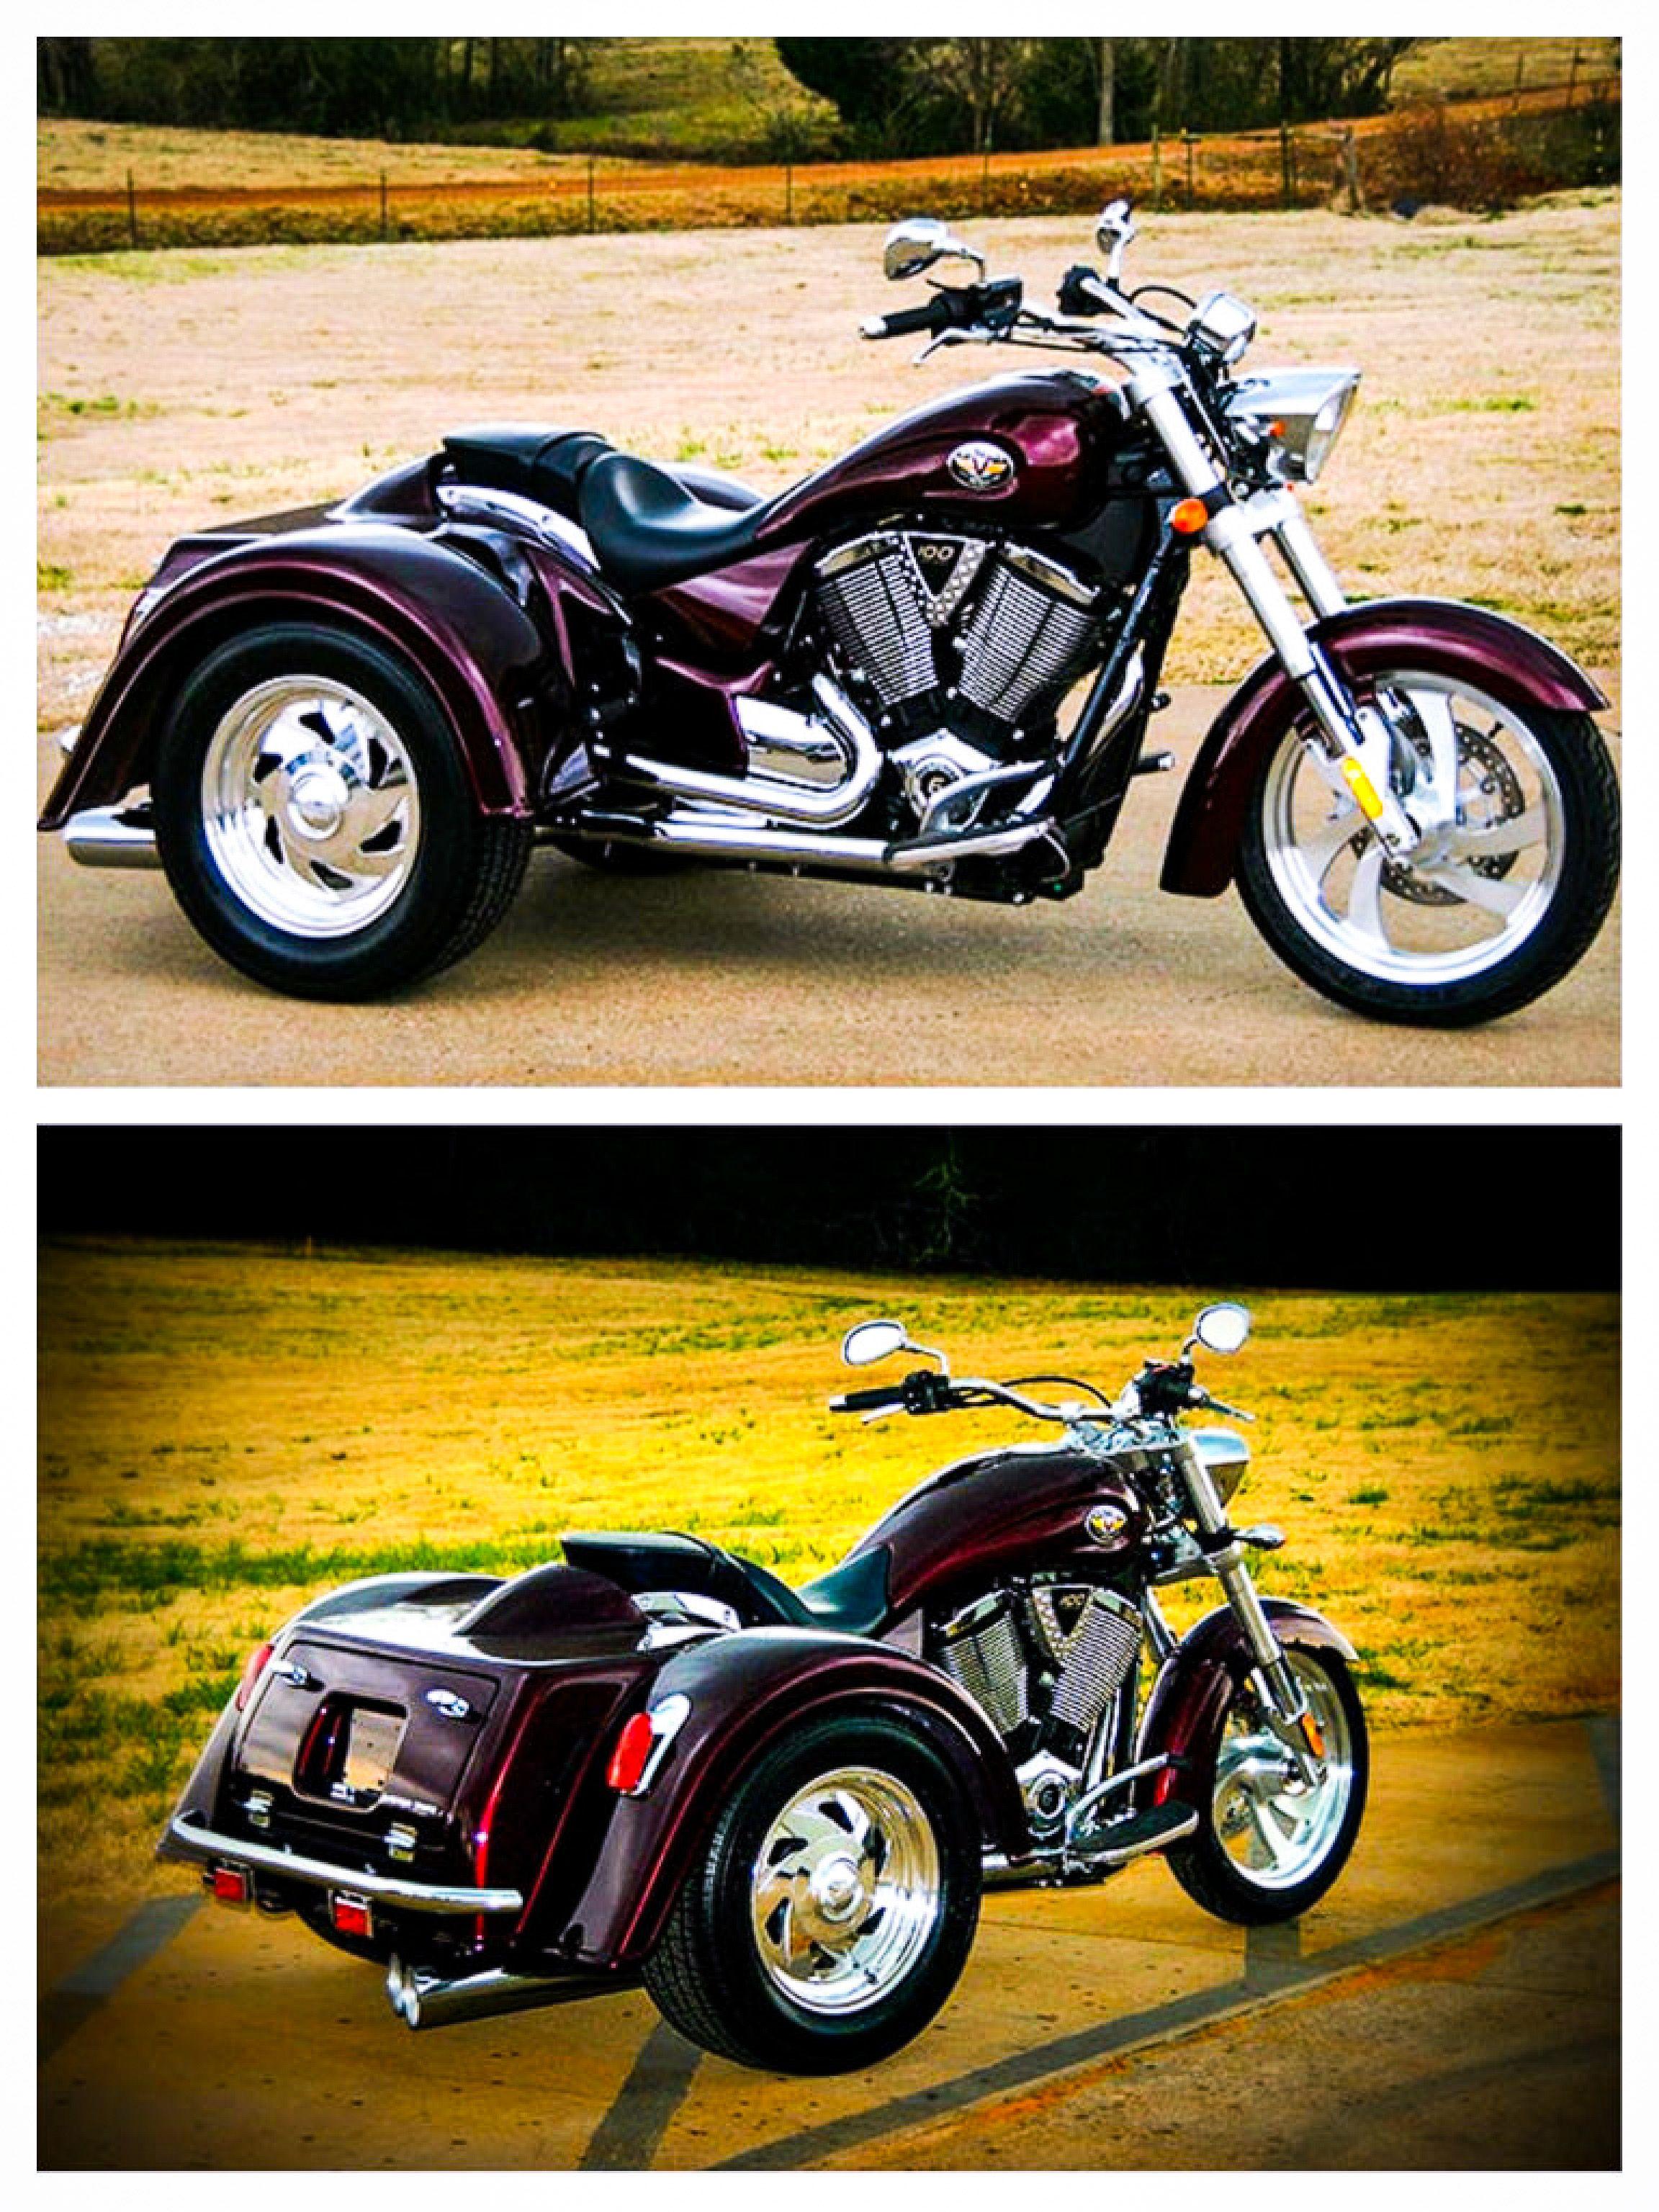 Motor Trike Inc Victory Kingpin Trike Kit Price 7 995 Http Www Motortrike Com Trikekingpin Aspx Trike Motorcycle Harley Bikes Trike